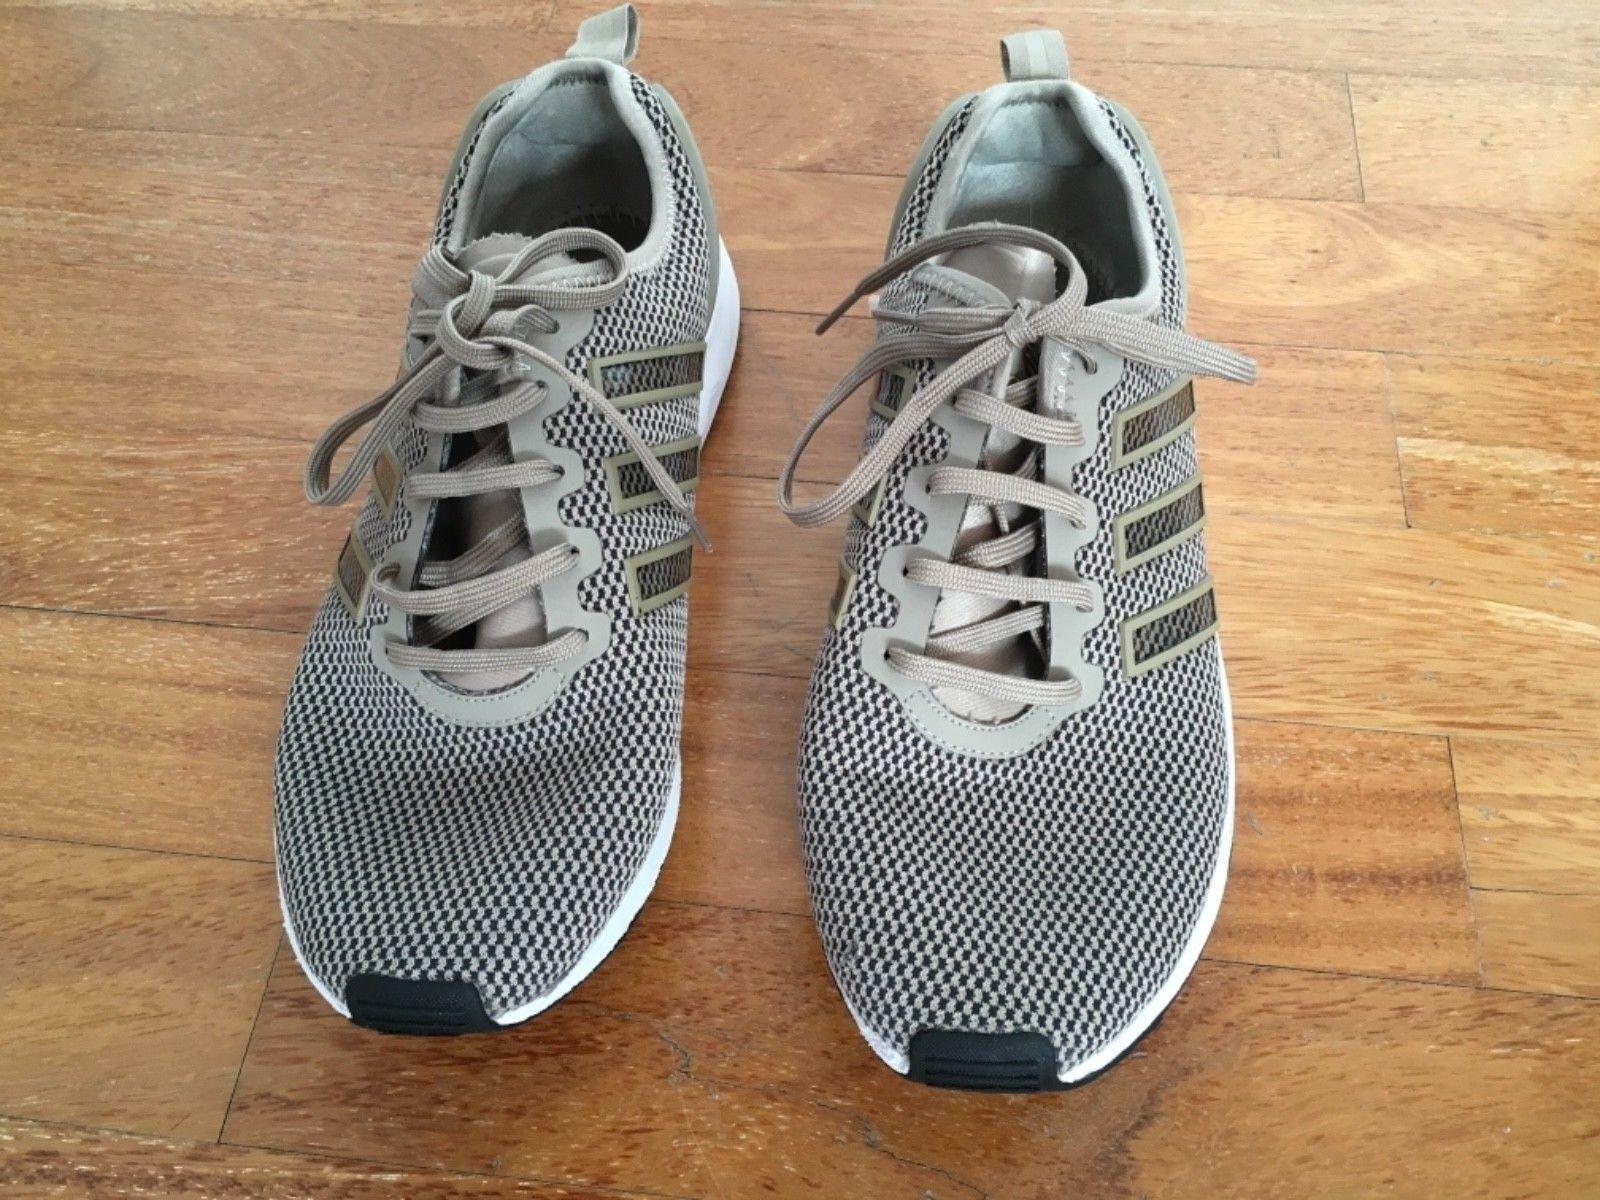 Adidas Sneakers Kaki/schwarz ADV Tubular US 9 Great discount